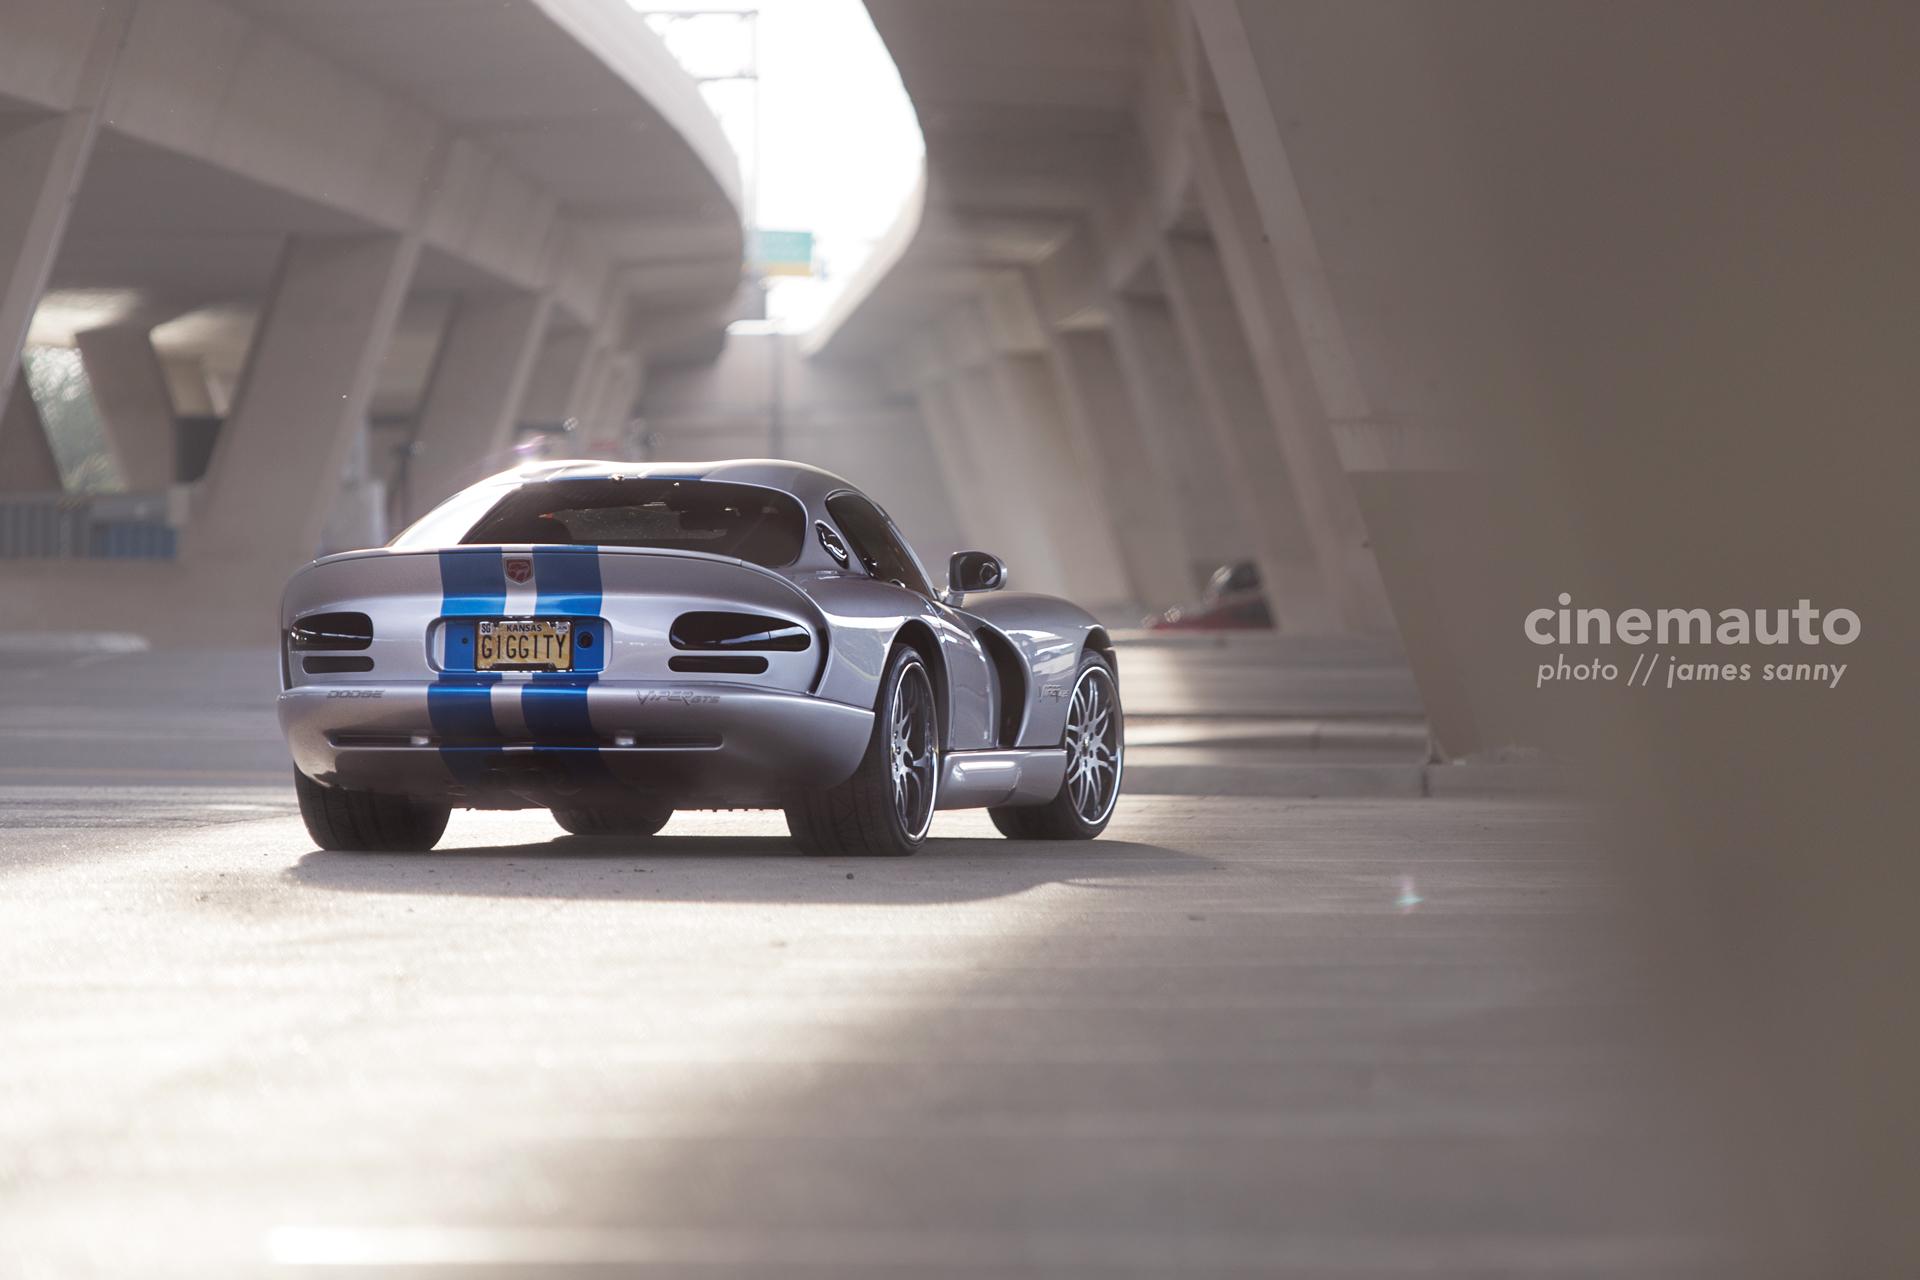 cinemauto-wichita-automotive-photography-ah1a.jpg